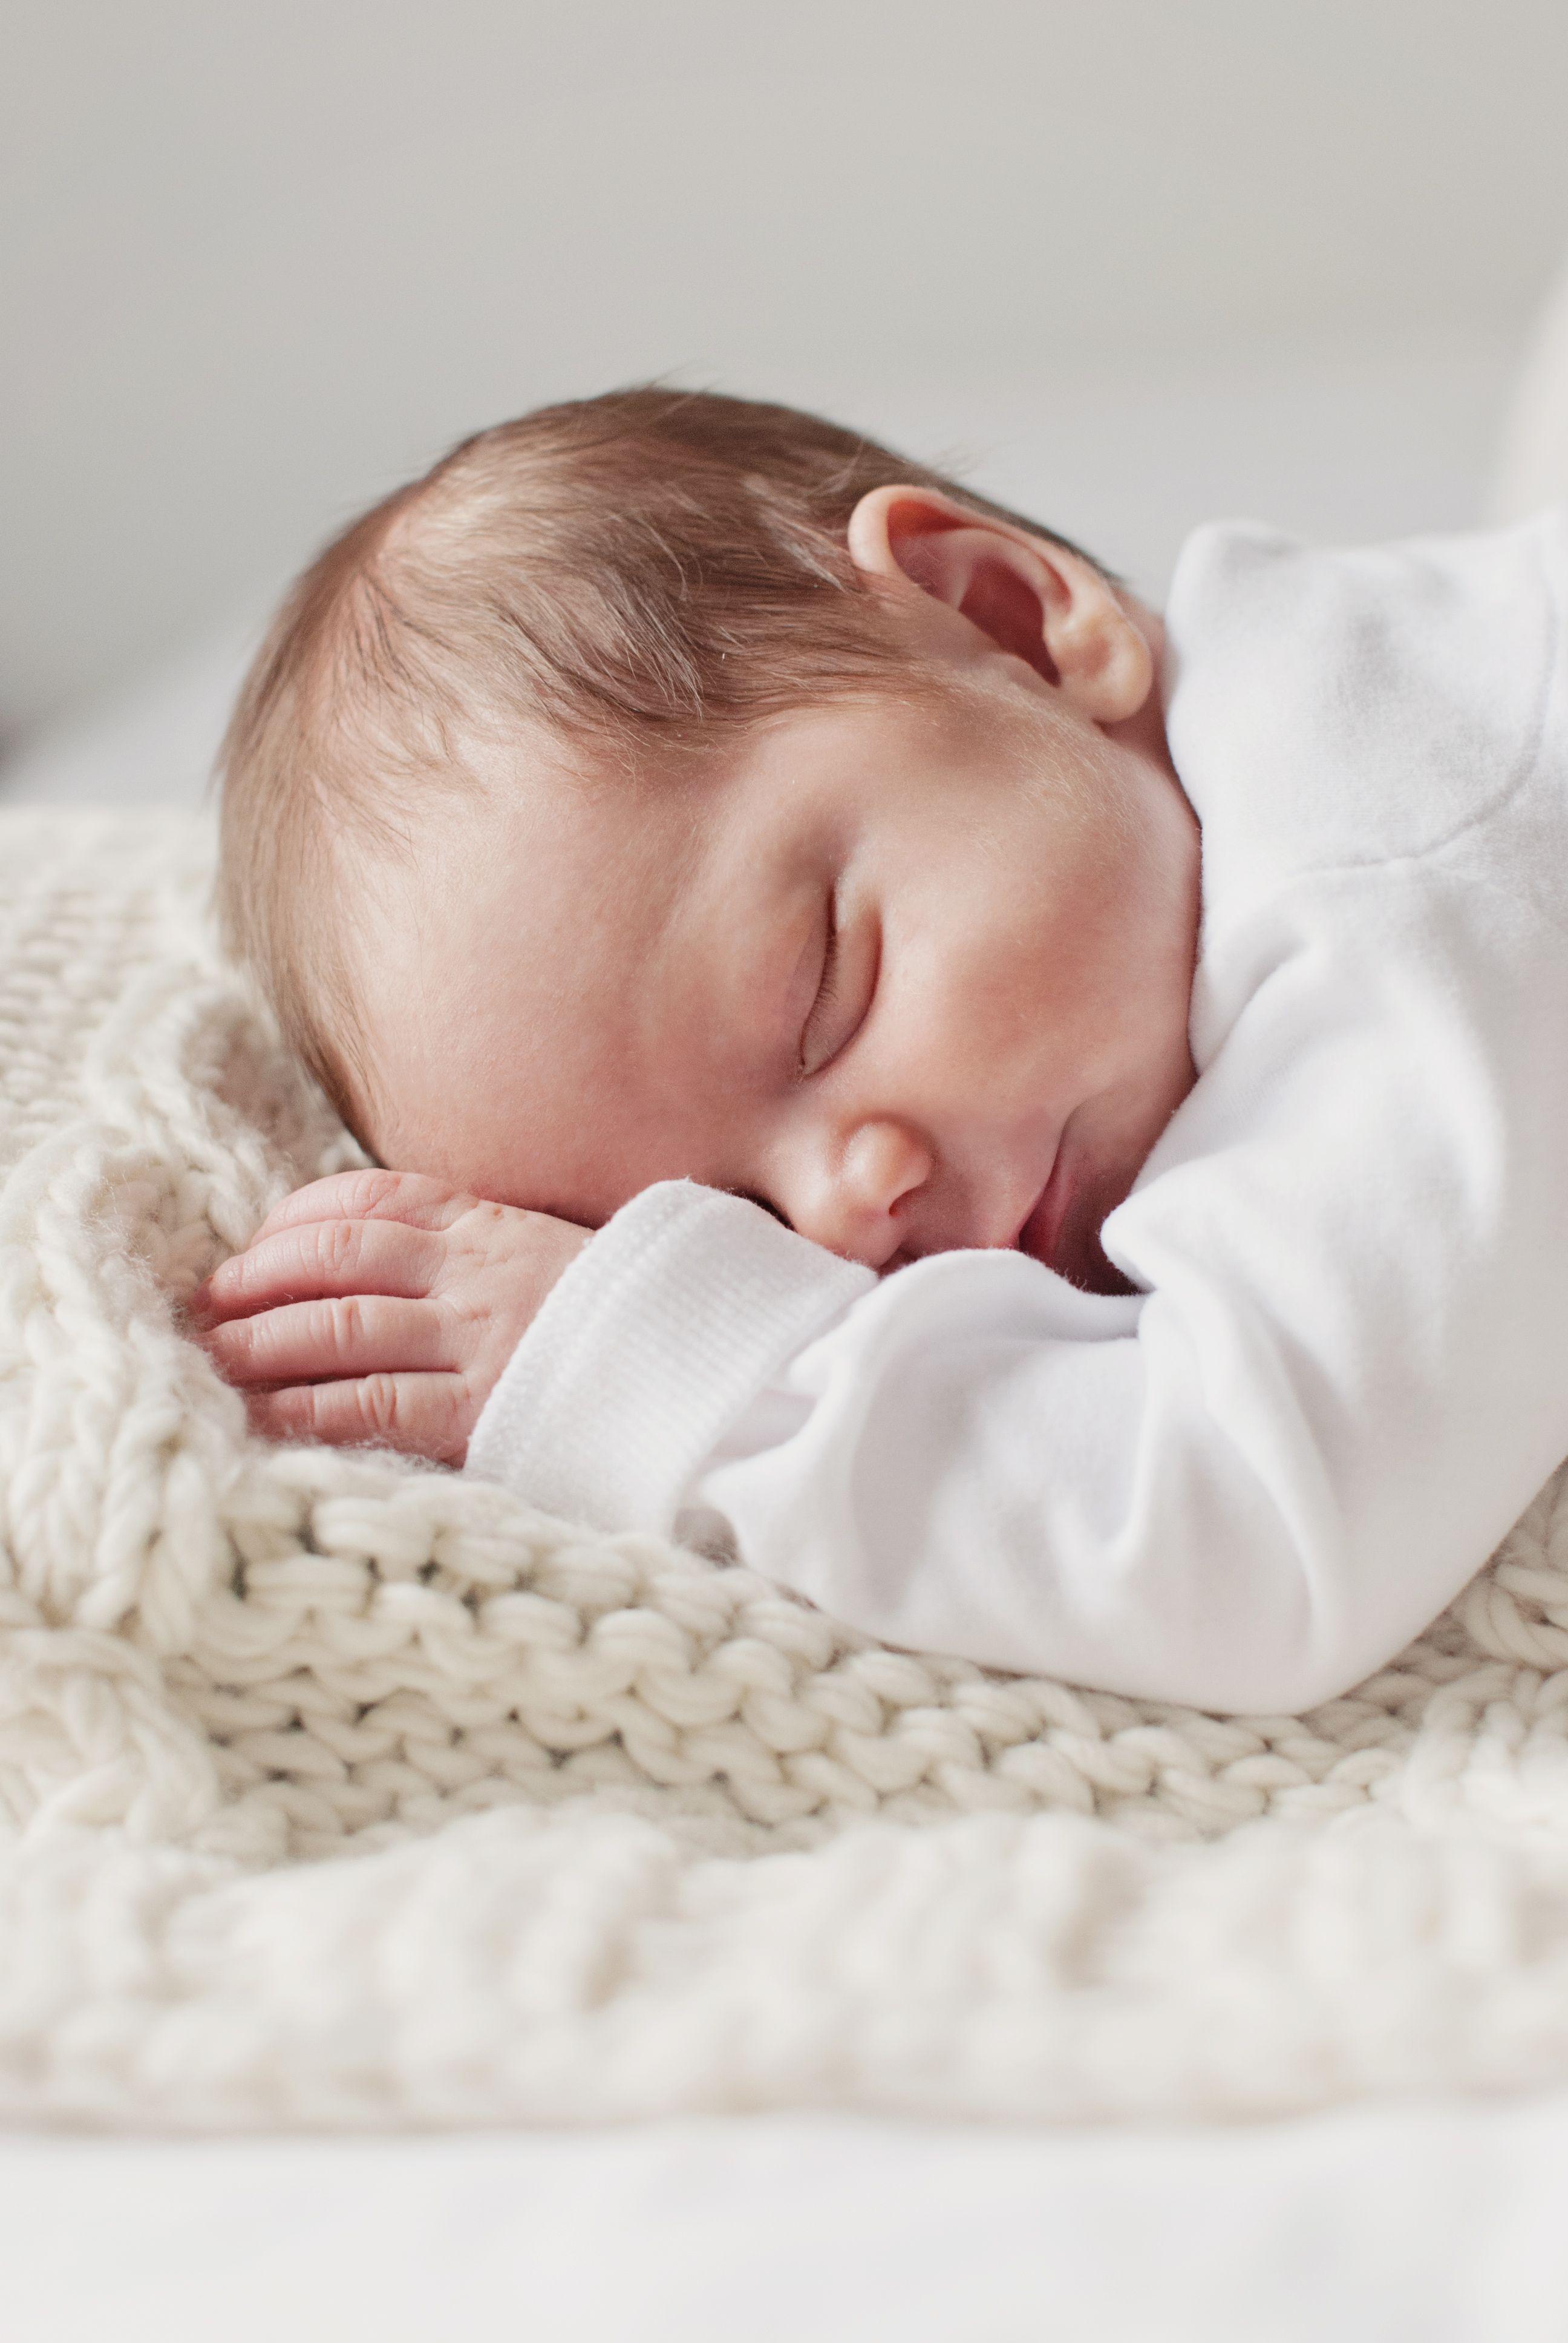 Zucker Baby Fotografie